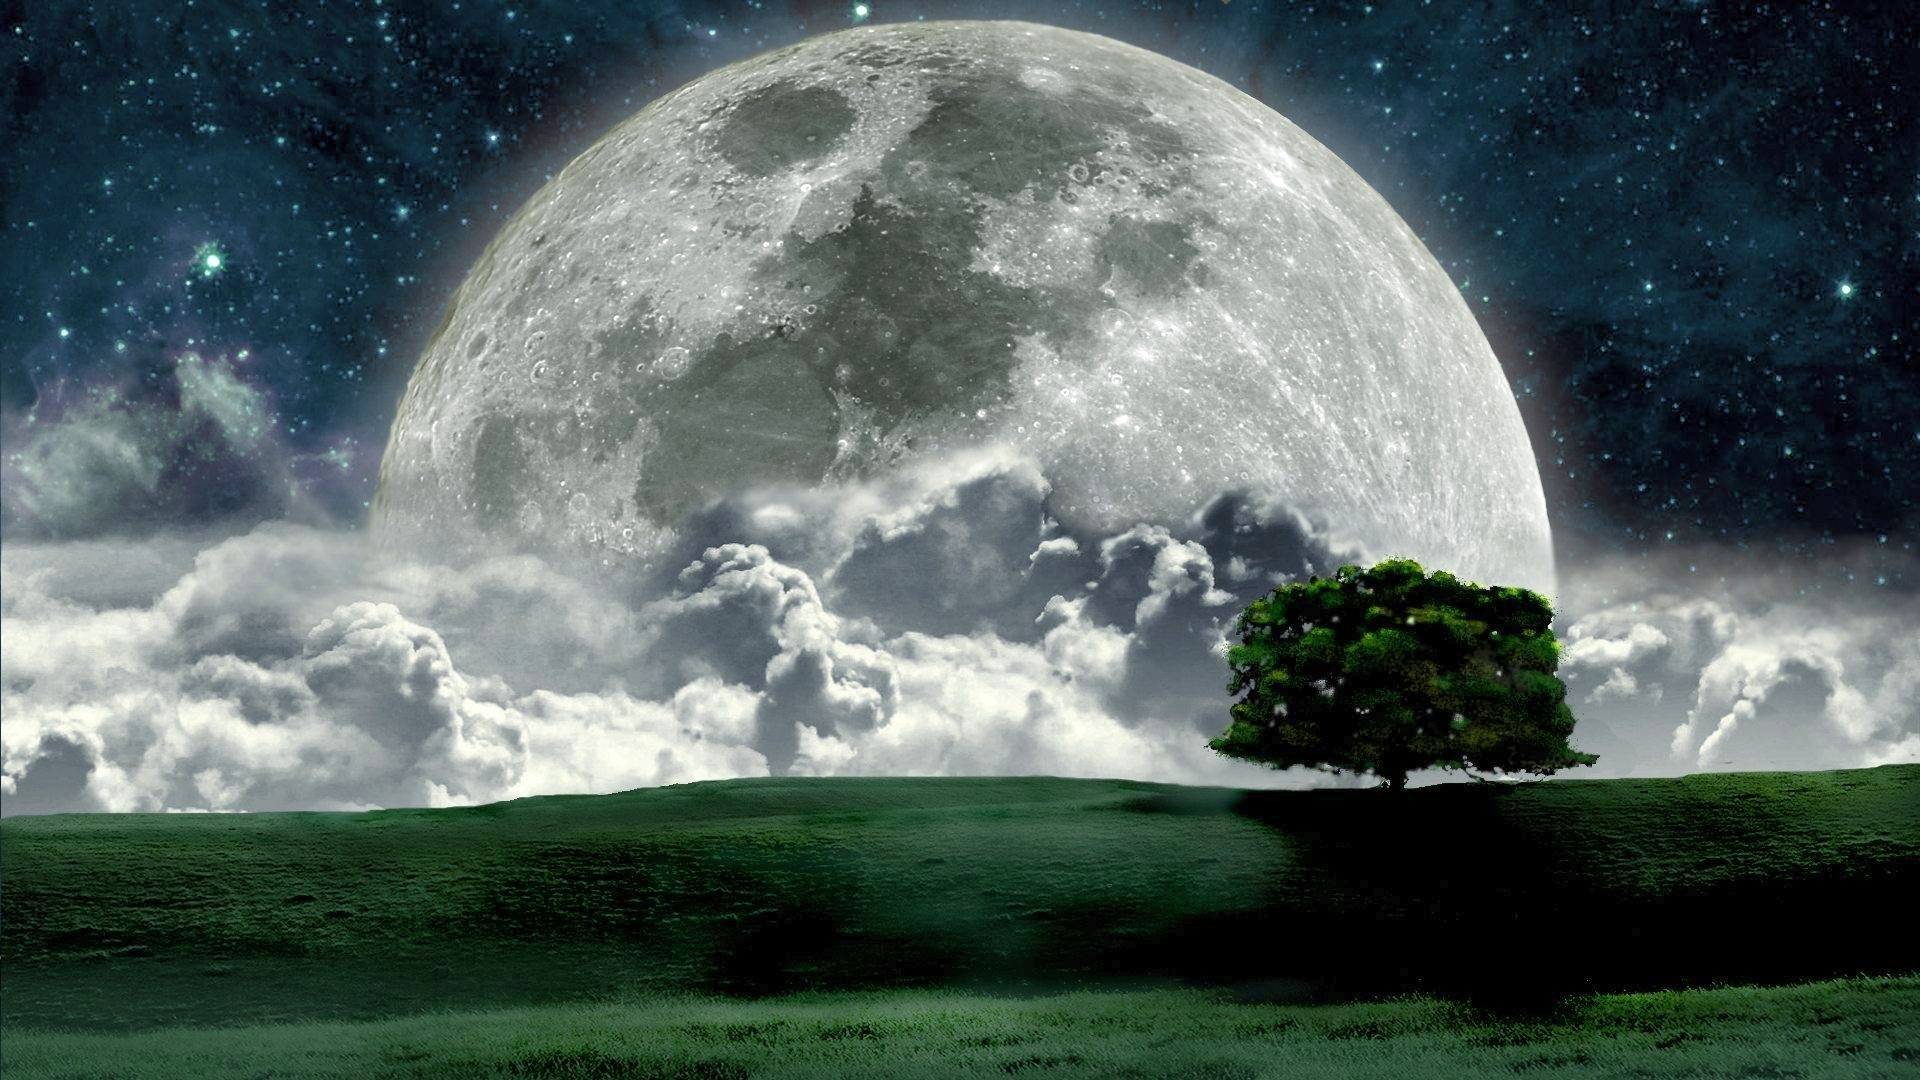 beautiful night moon photos hd wallpaper free full moon wallpaper